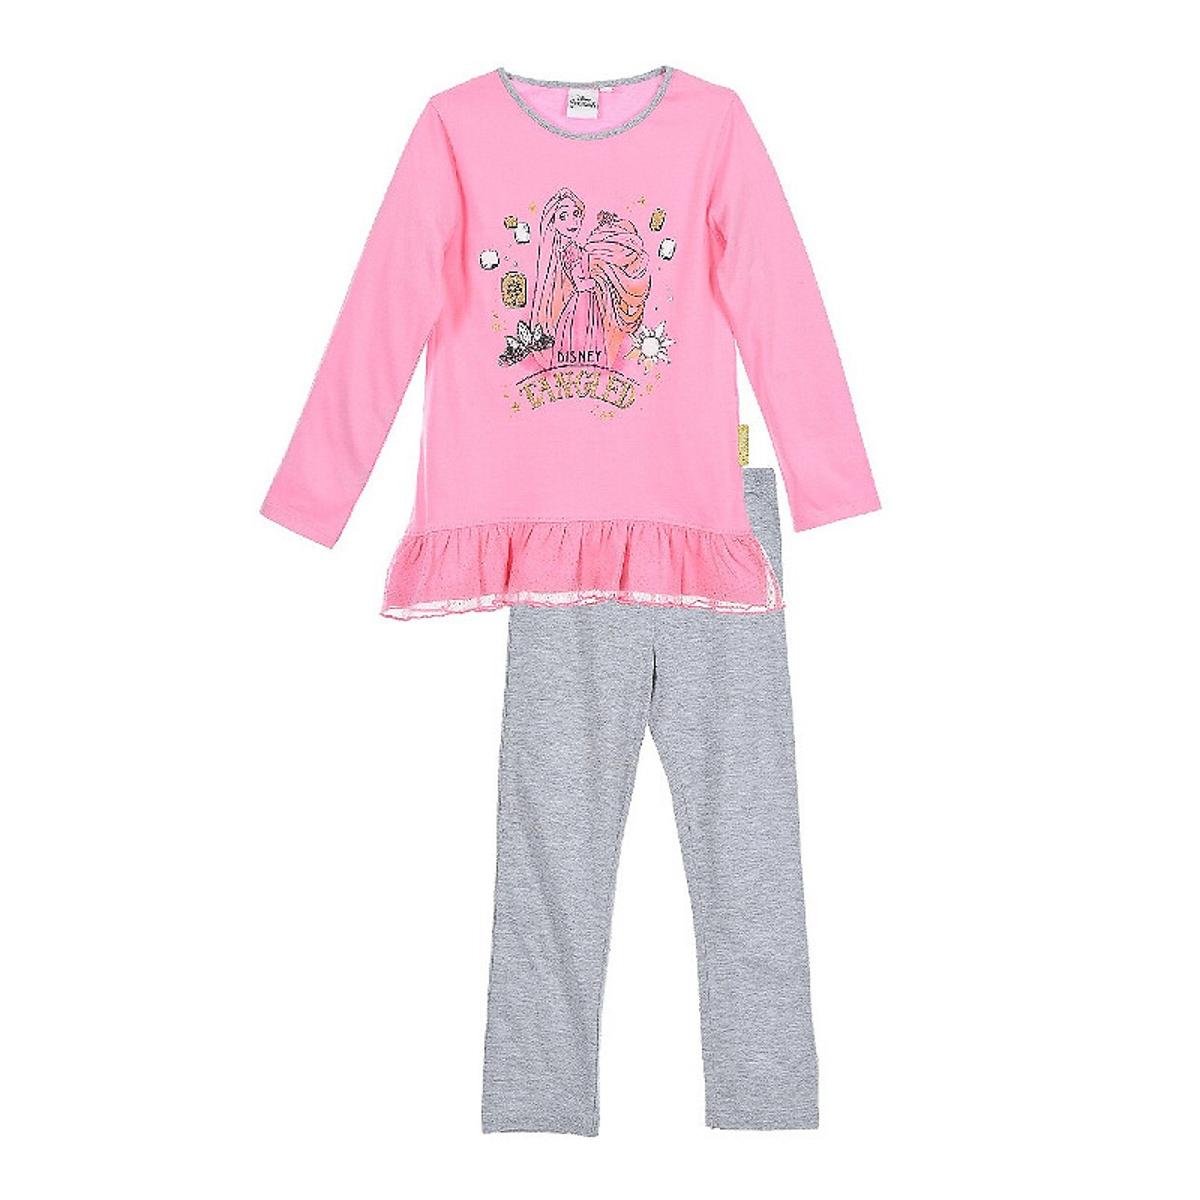 cotton long-sleeved pyjamas, 3-6 years